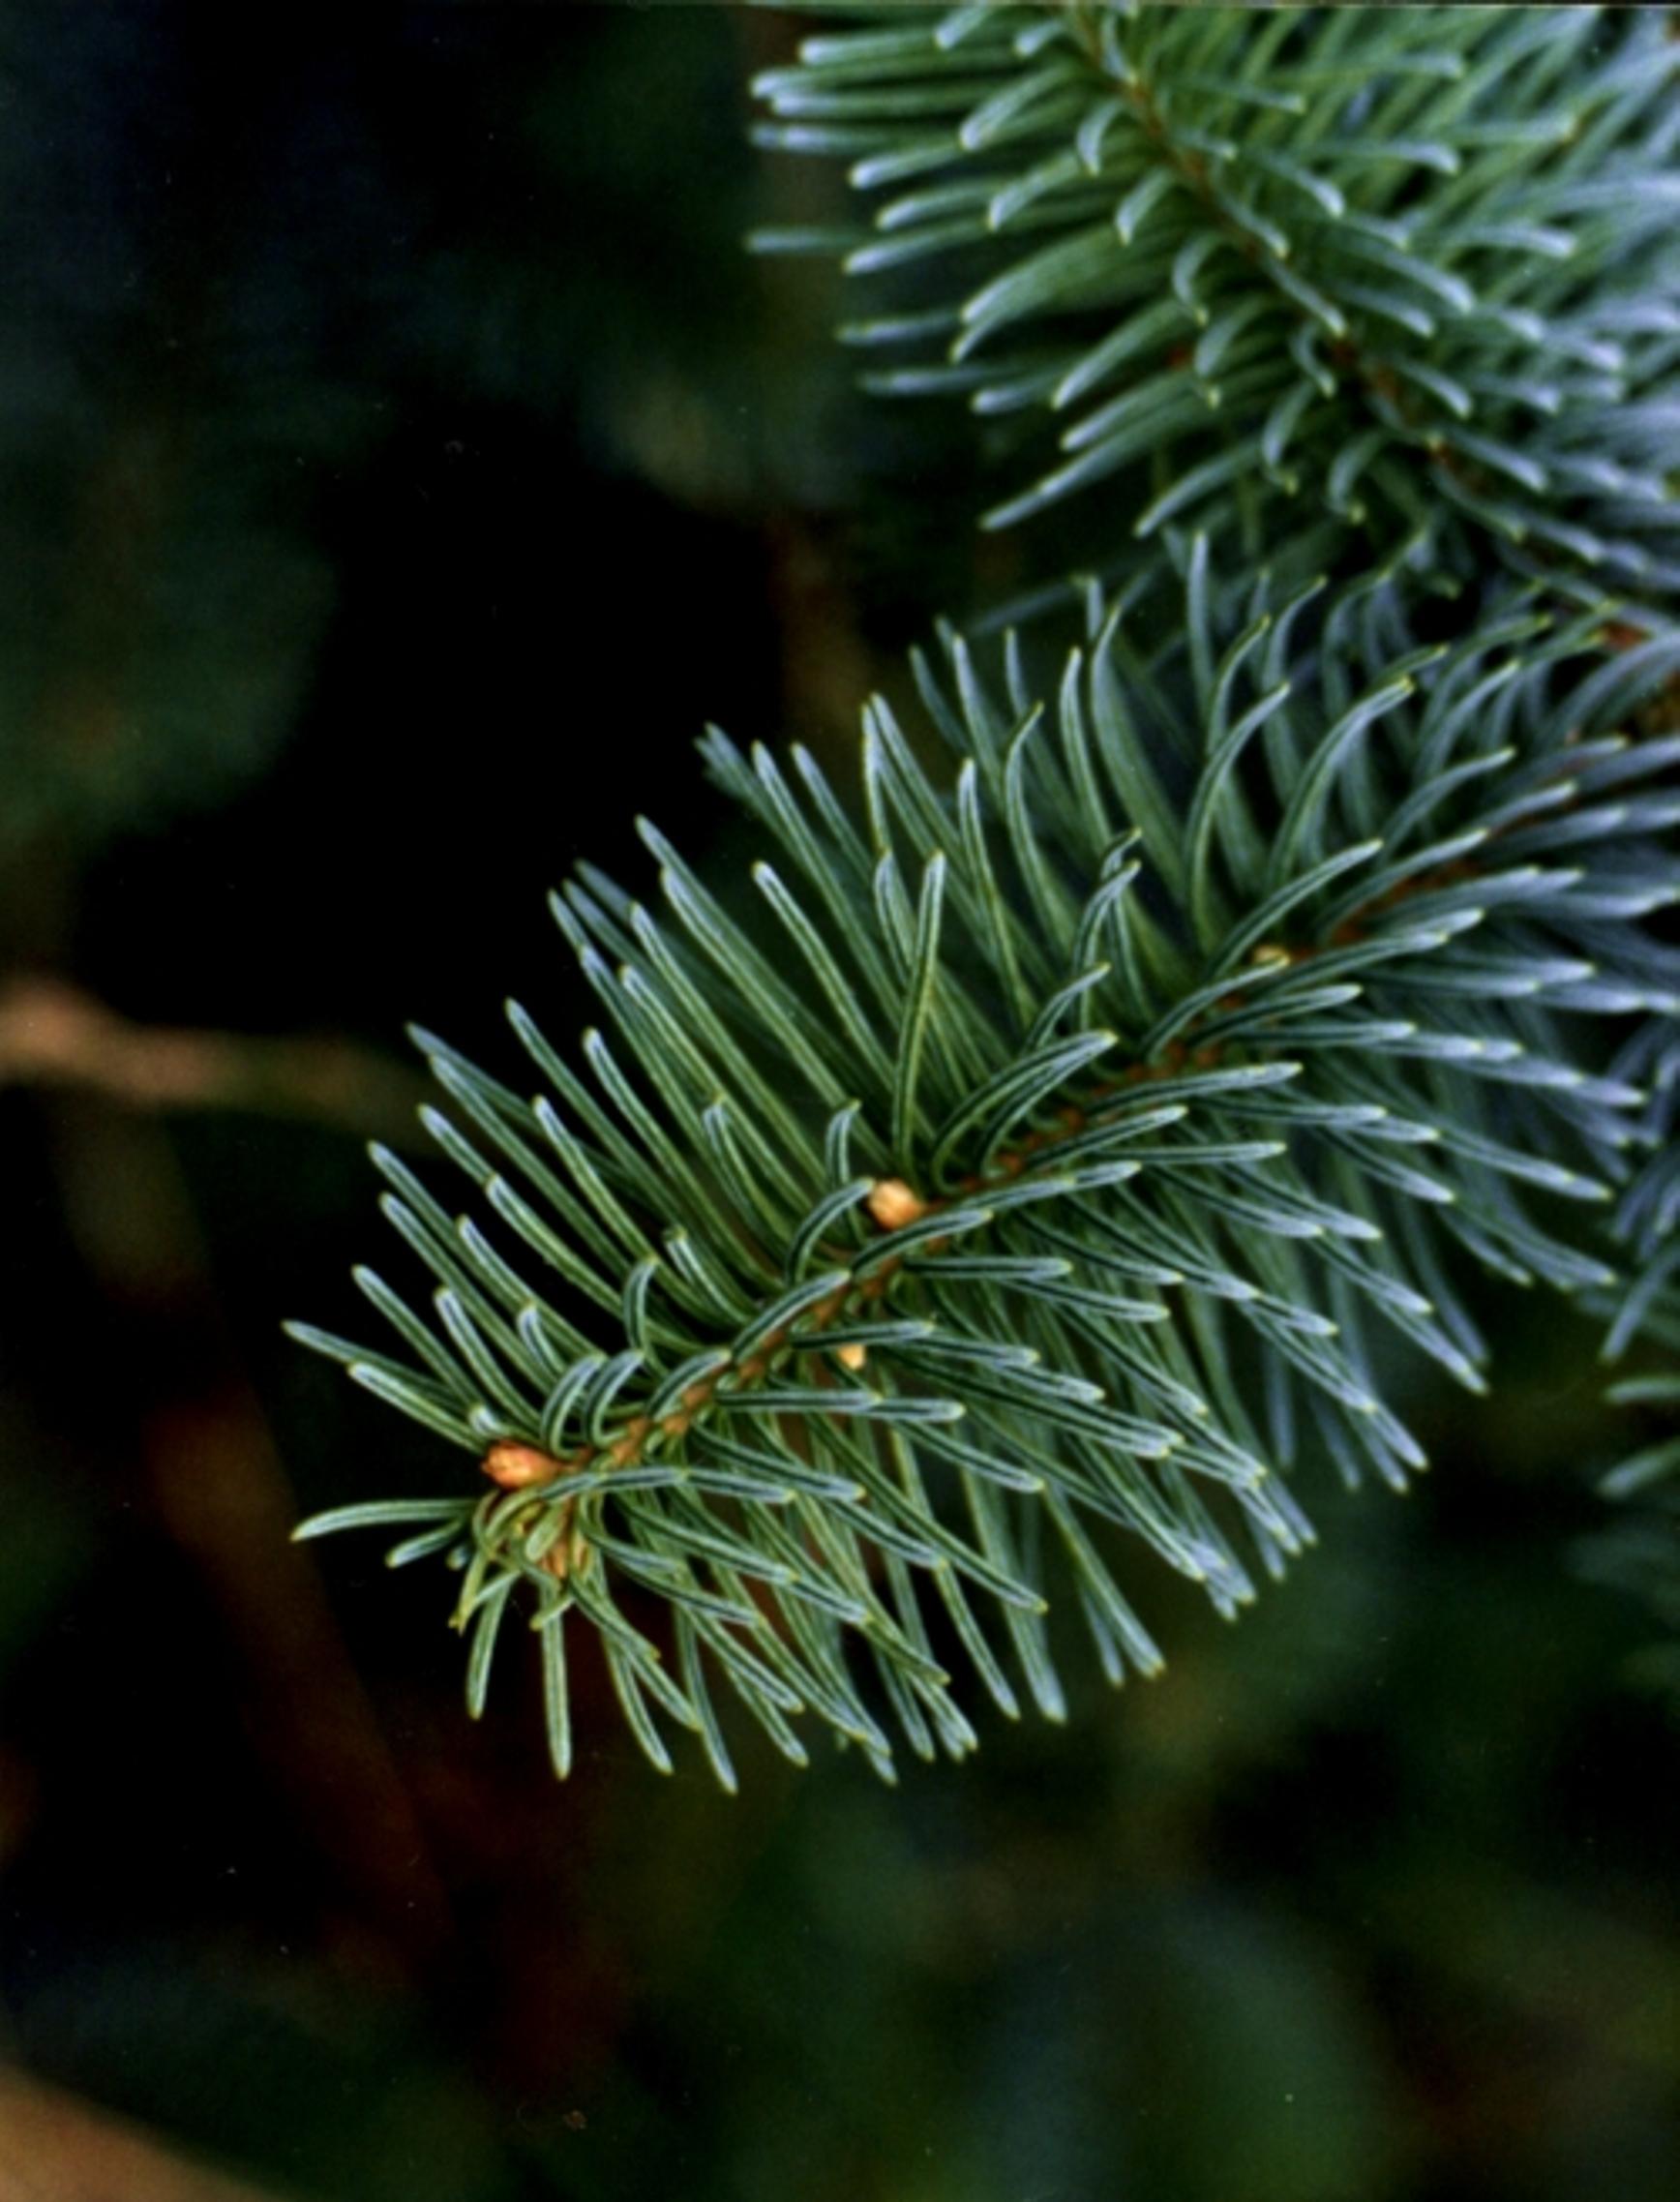 Noble Fir Christmas Tree Close Up